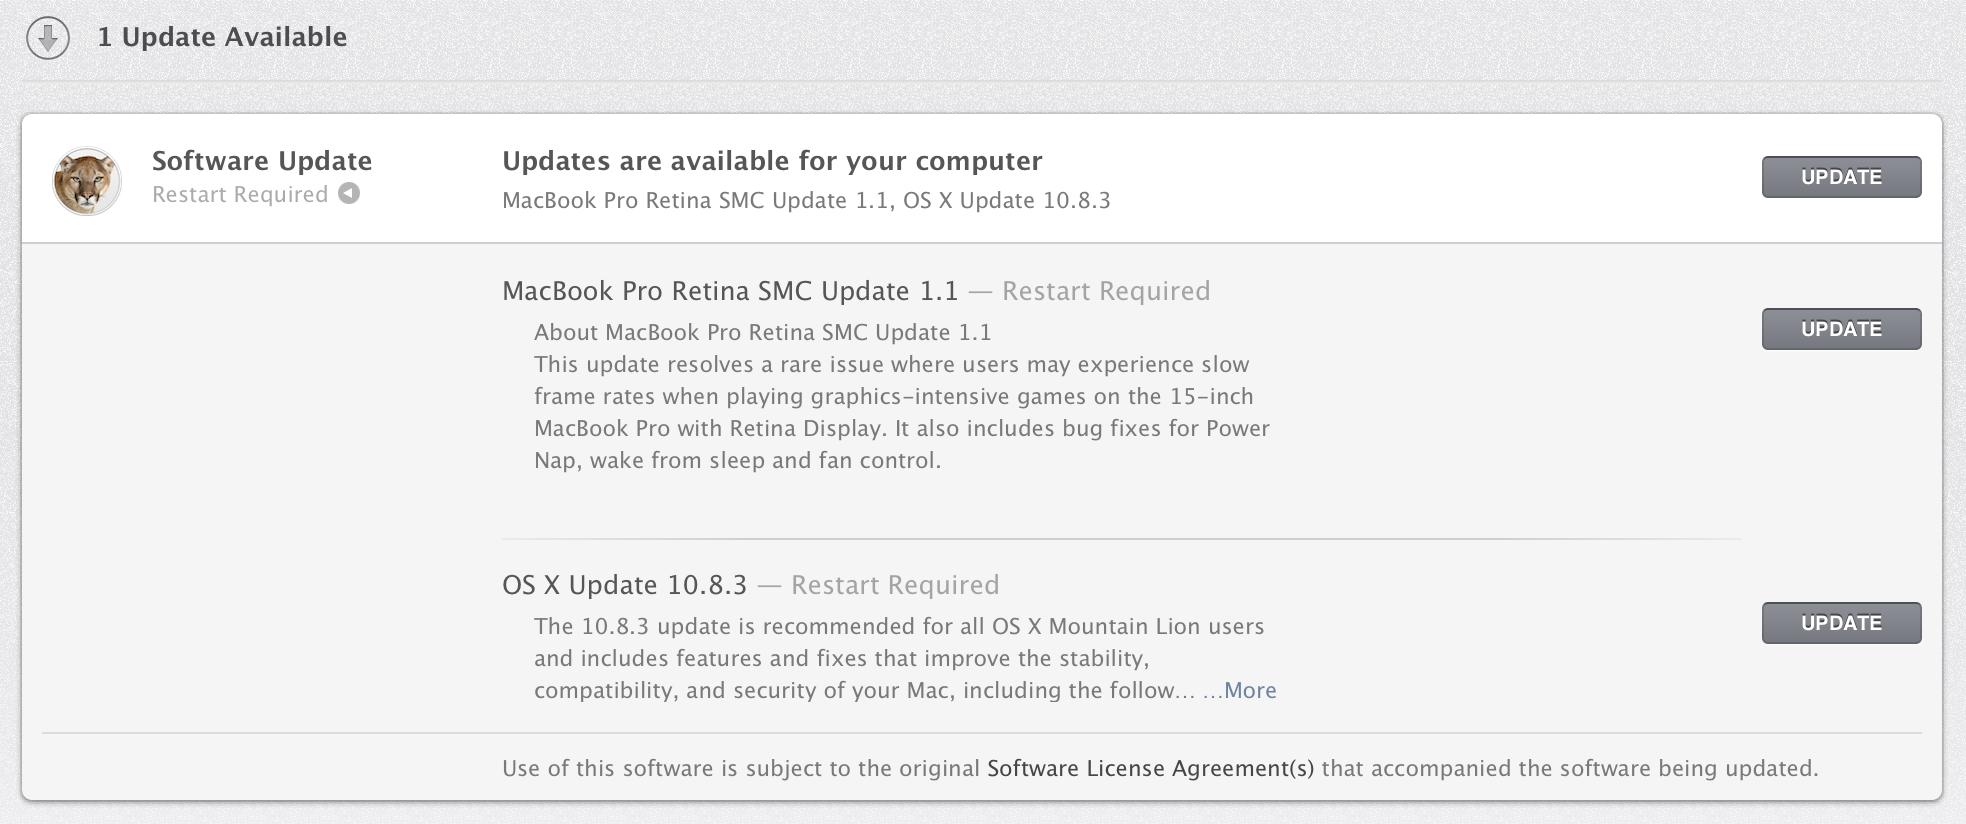 MacBook Pro Retina Update Released – Fixes Key Issues (SMC, OSX)